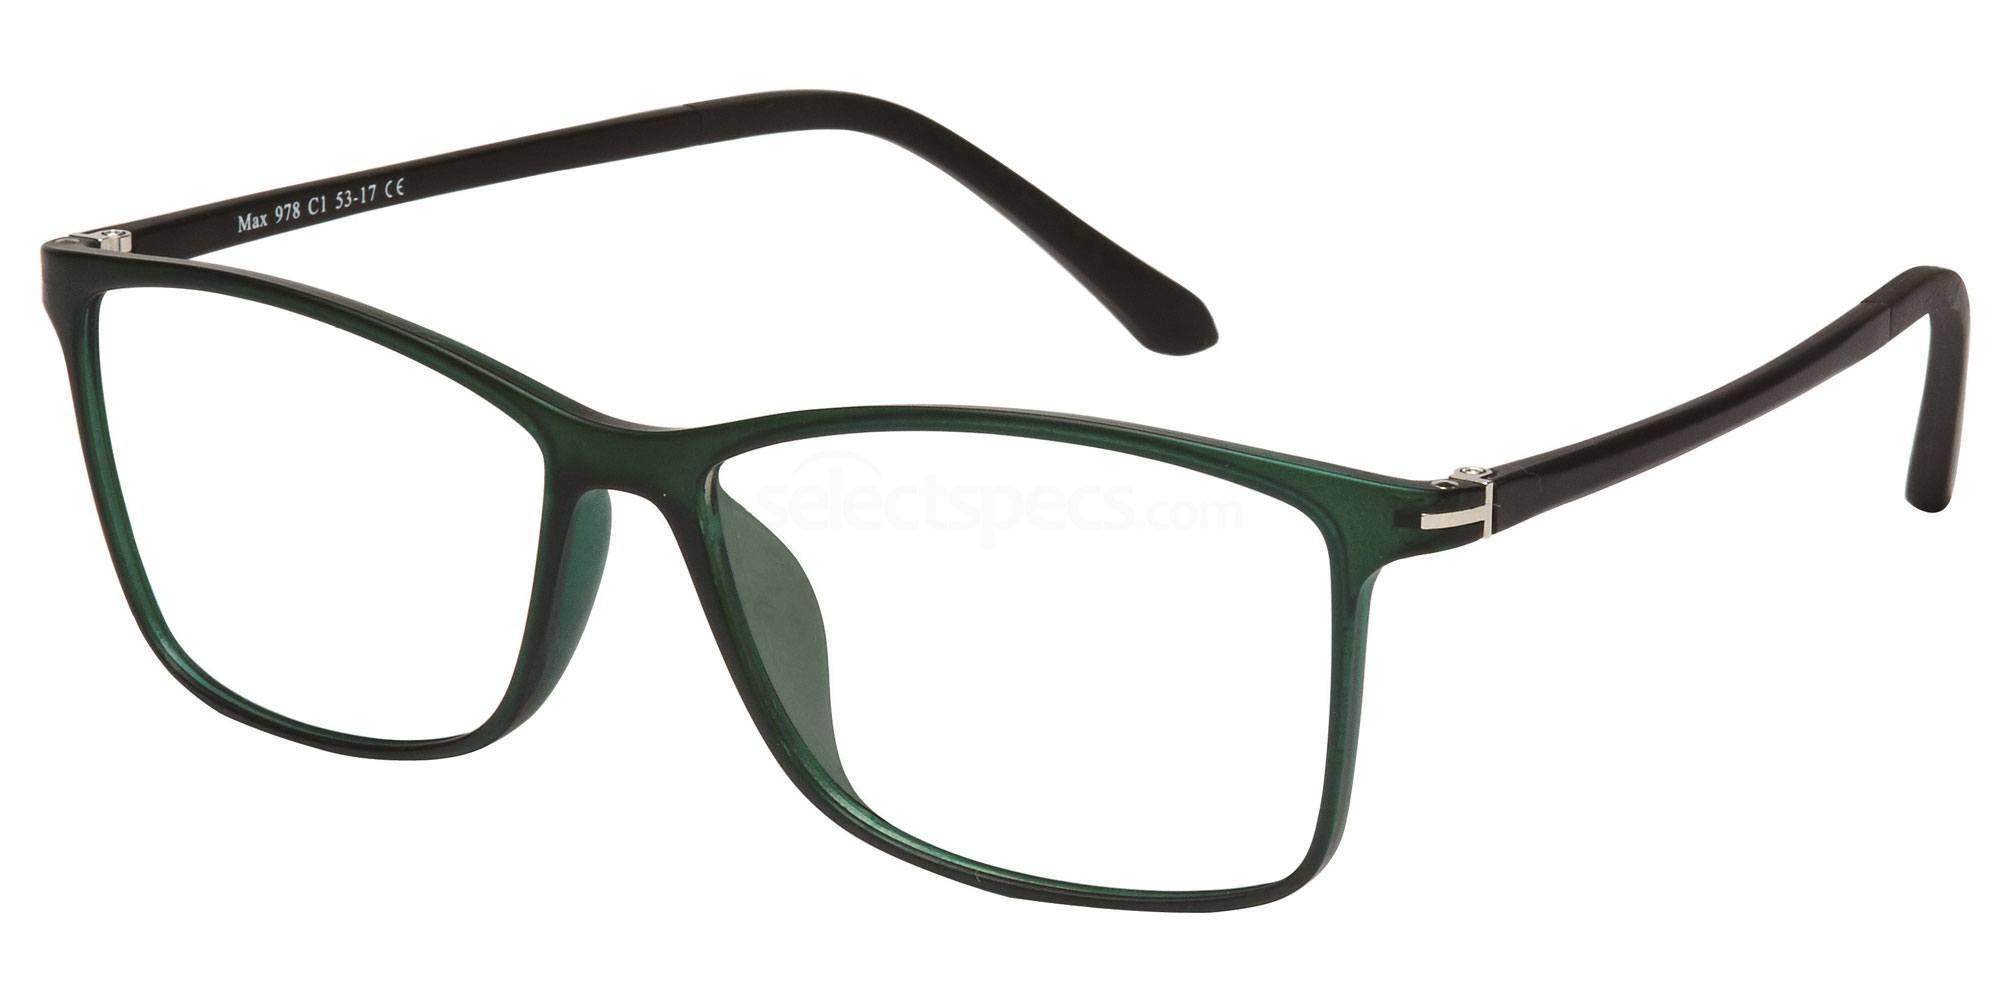 C1 M978 Glasses, Max Eyewear